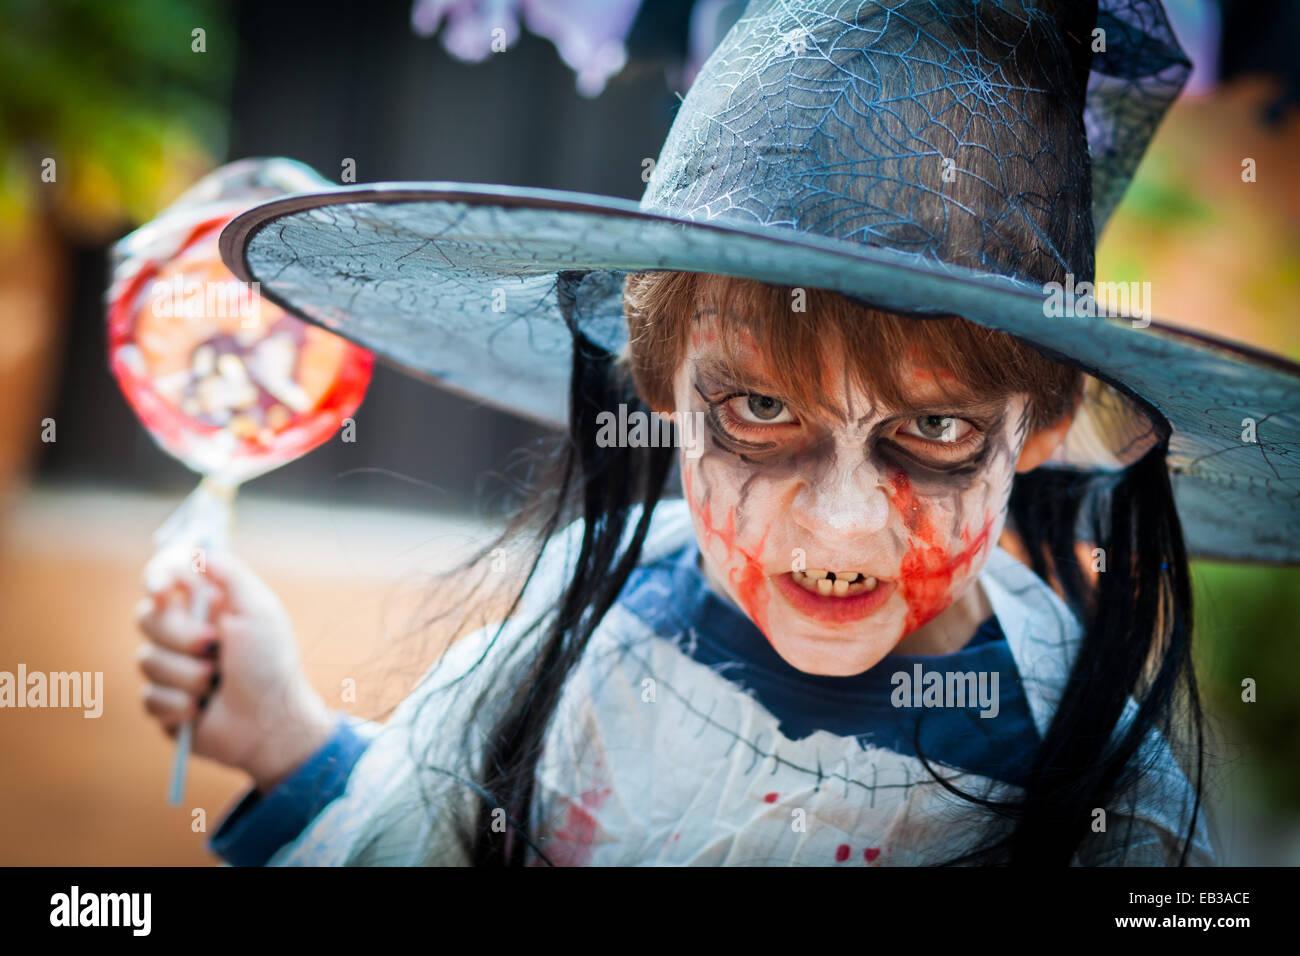 Boy (8-9) con traje de miedo para Halloween Imagen De Stock